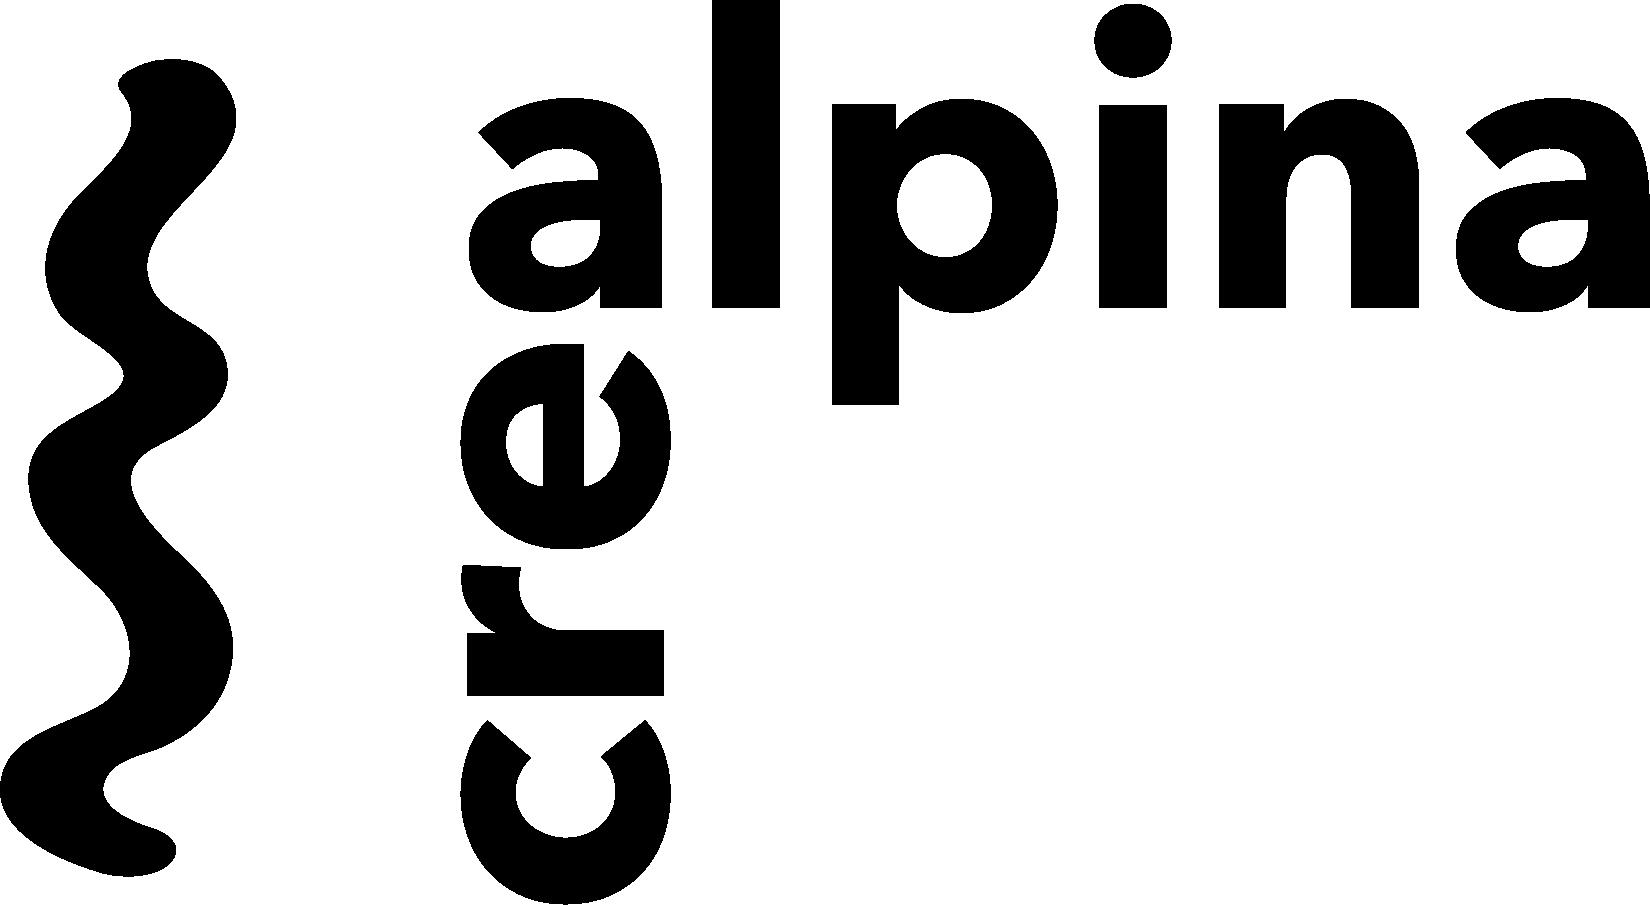 Crealpina